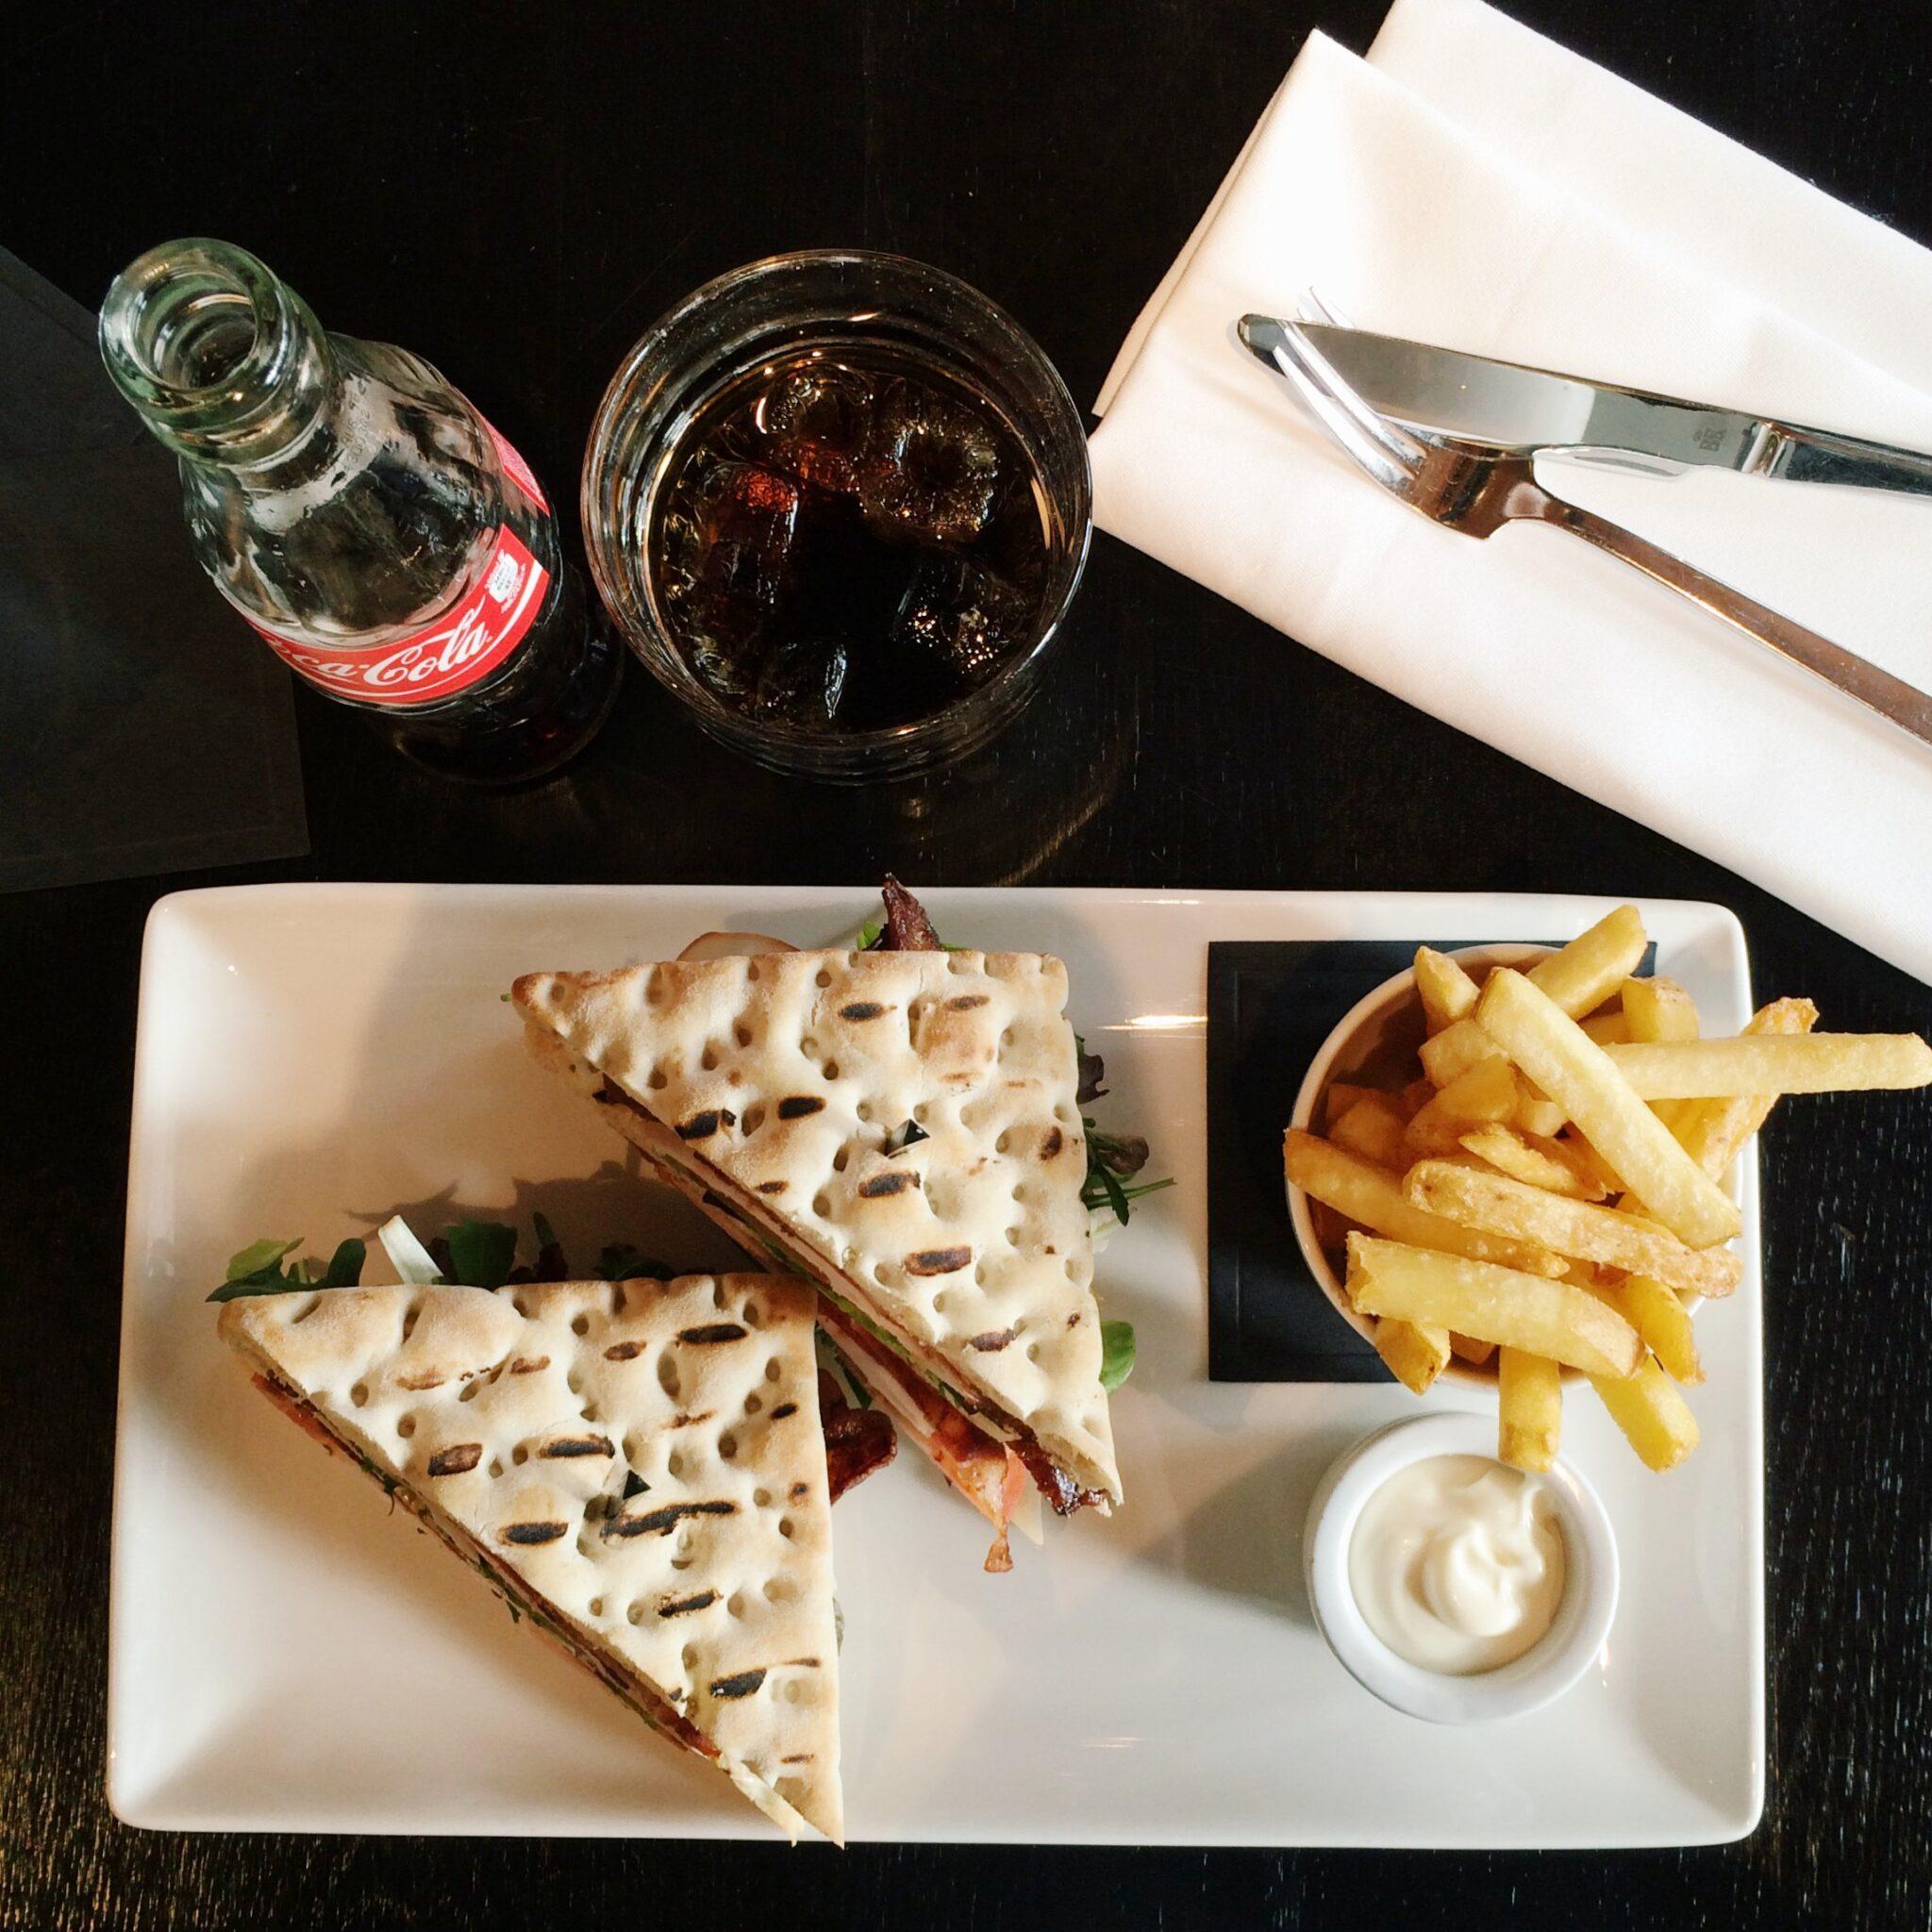 IMG 2468 e1425394634148 - Restaurant Van Rijn Kitchen and Bar